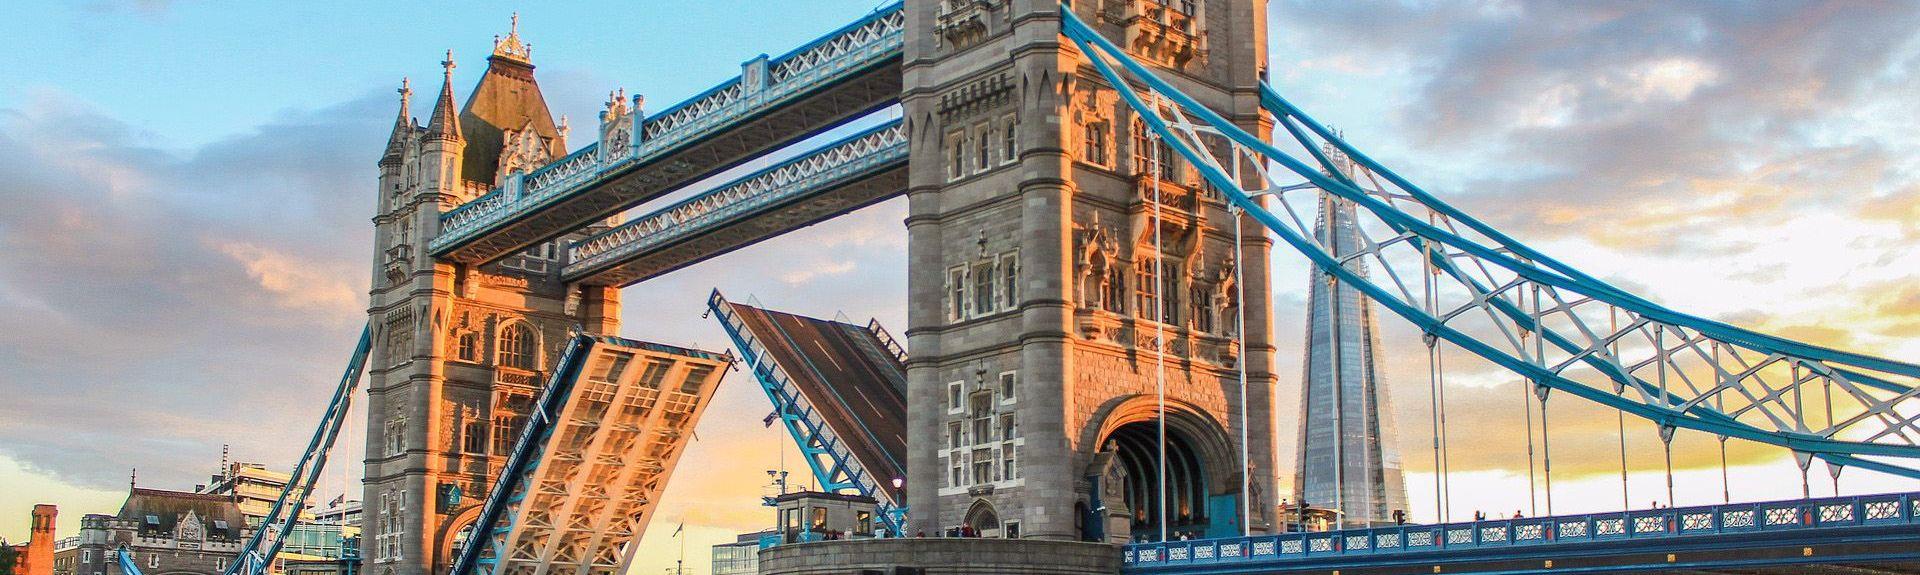 Westminster, London, England, United Kingdom